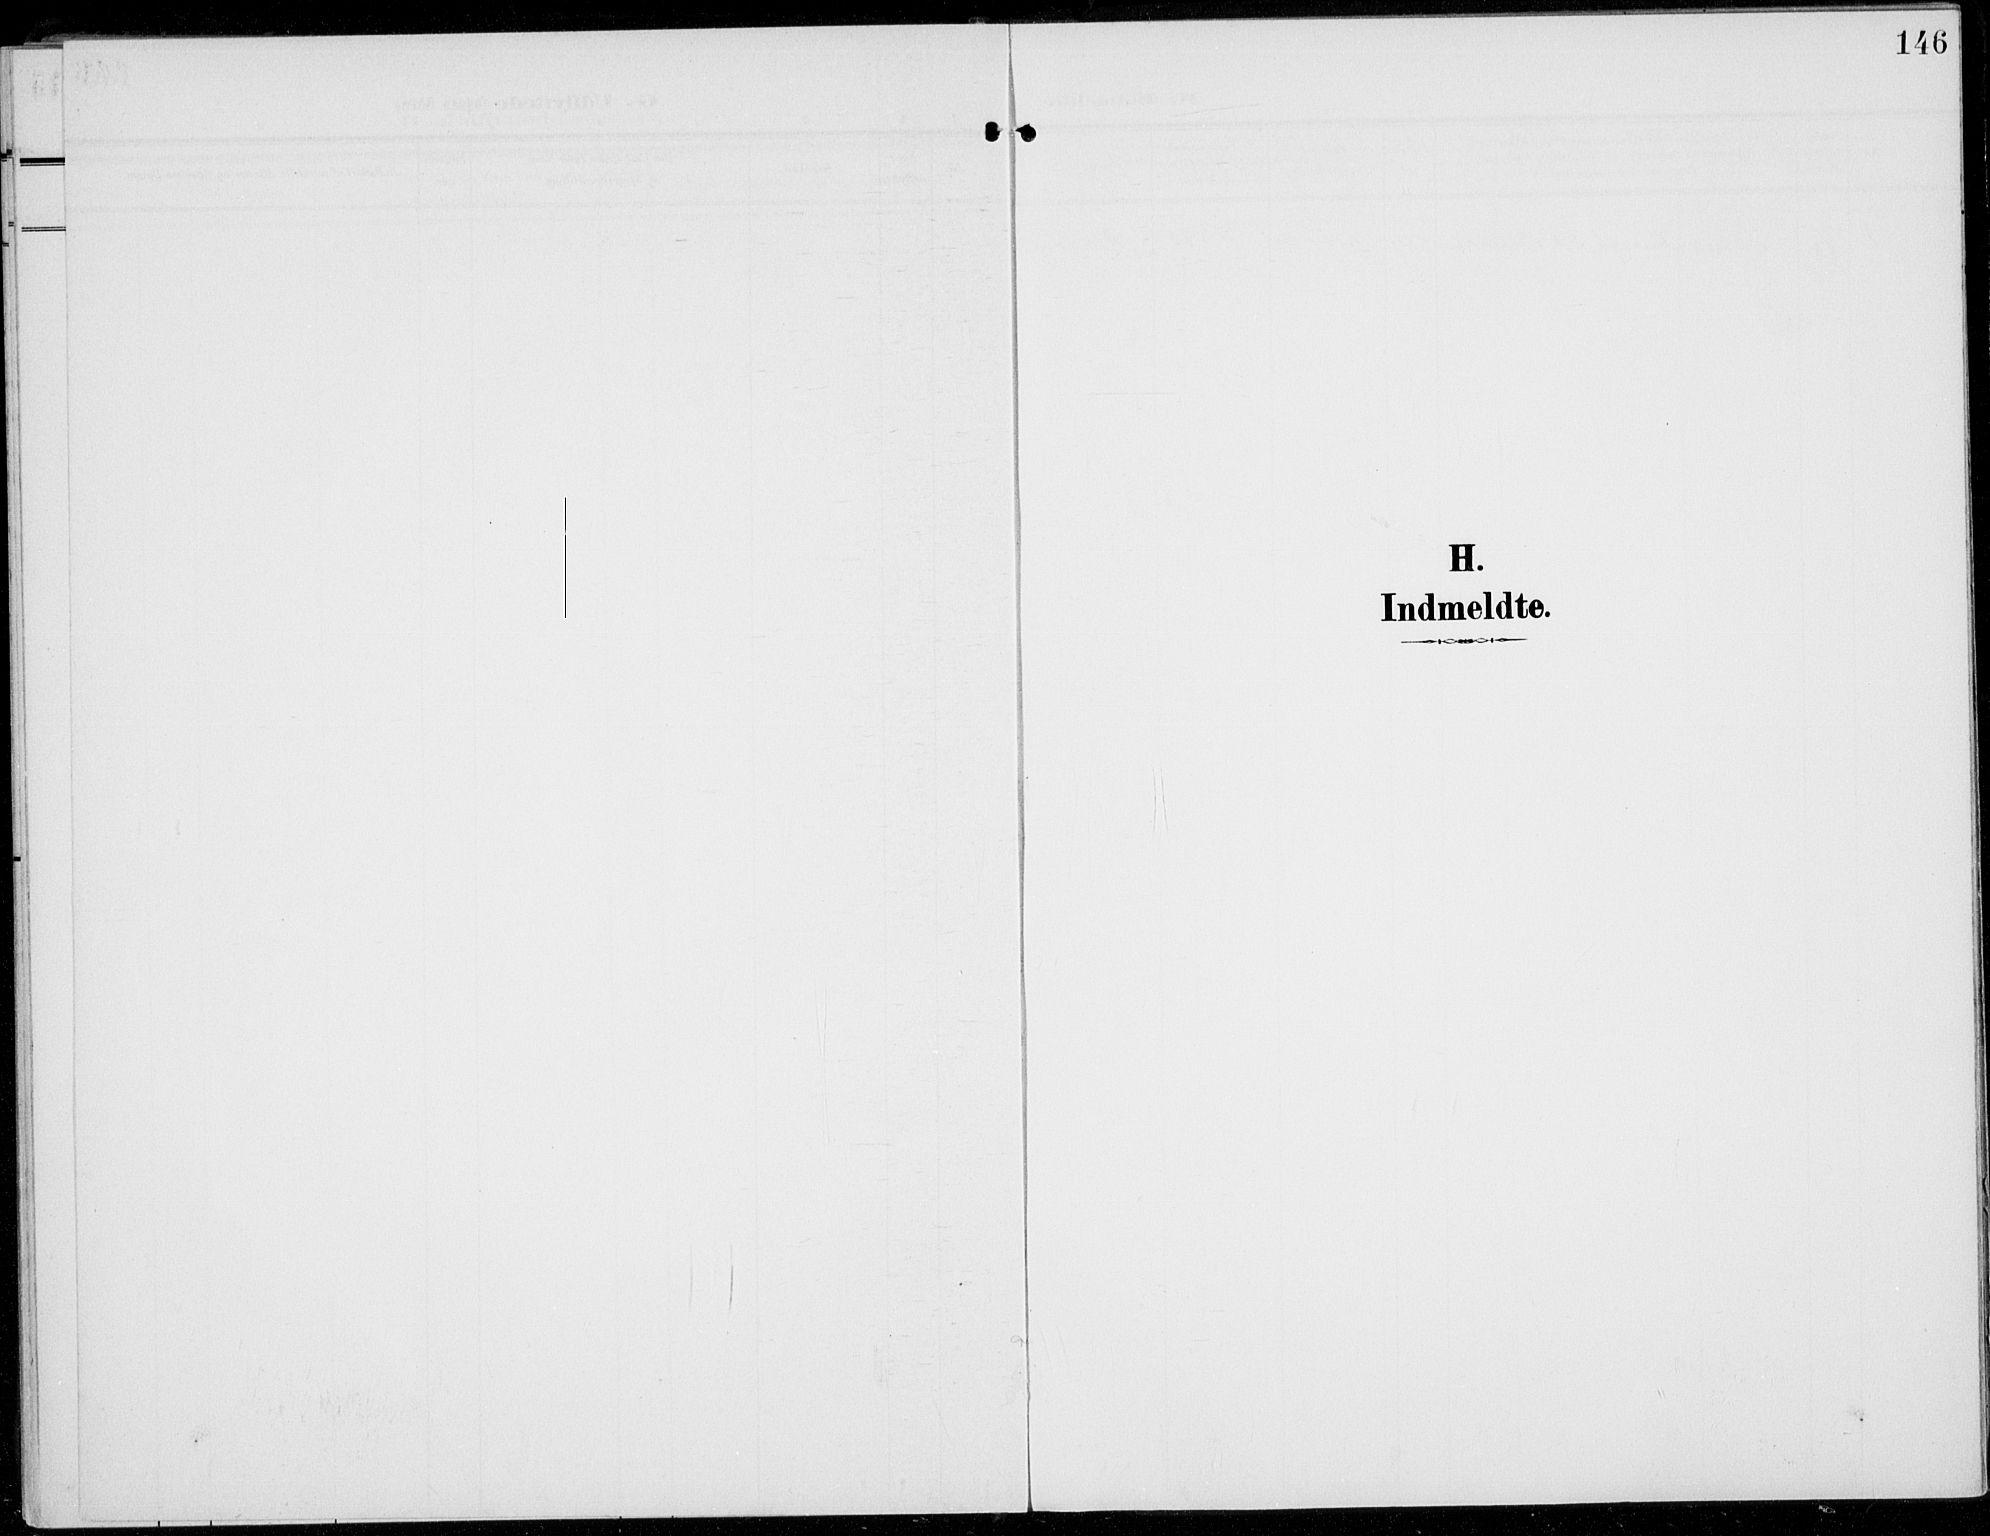 SAH, Sel prestekontor, Ministerialbok nr. 1, 1905-1922, s. 146